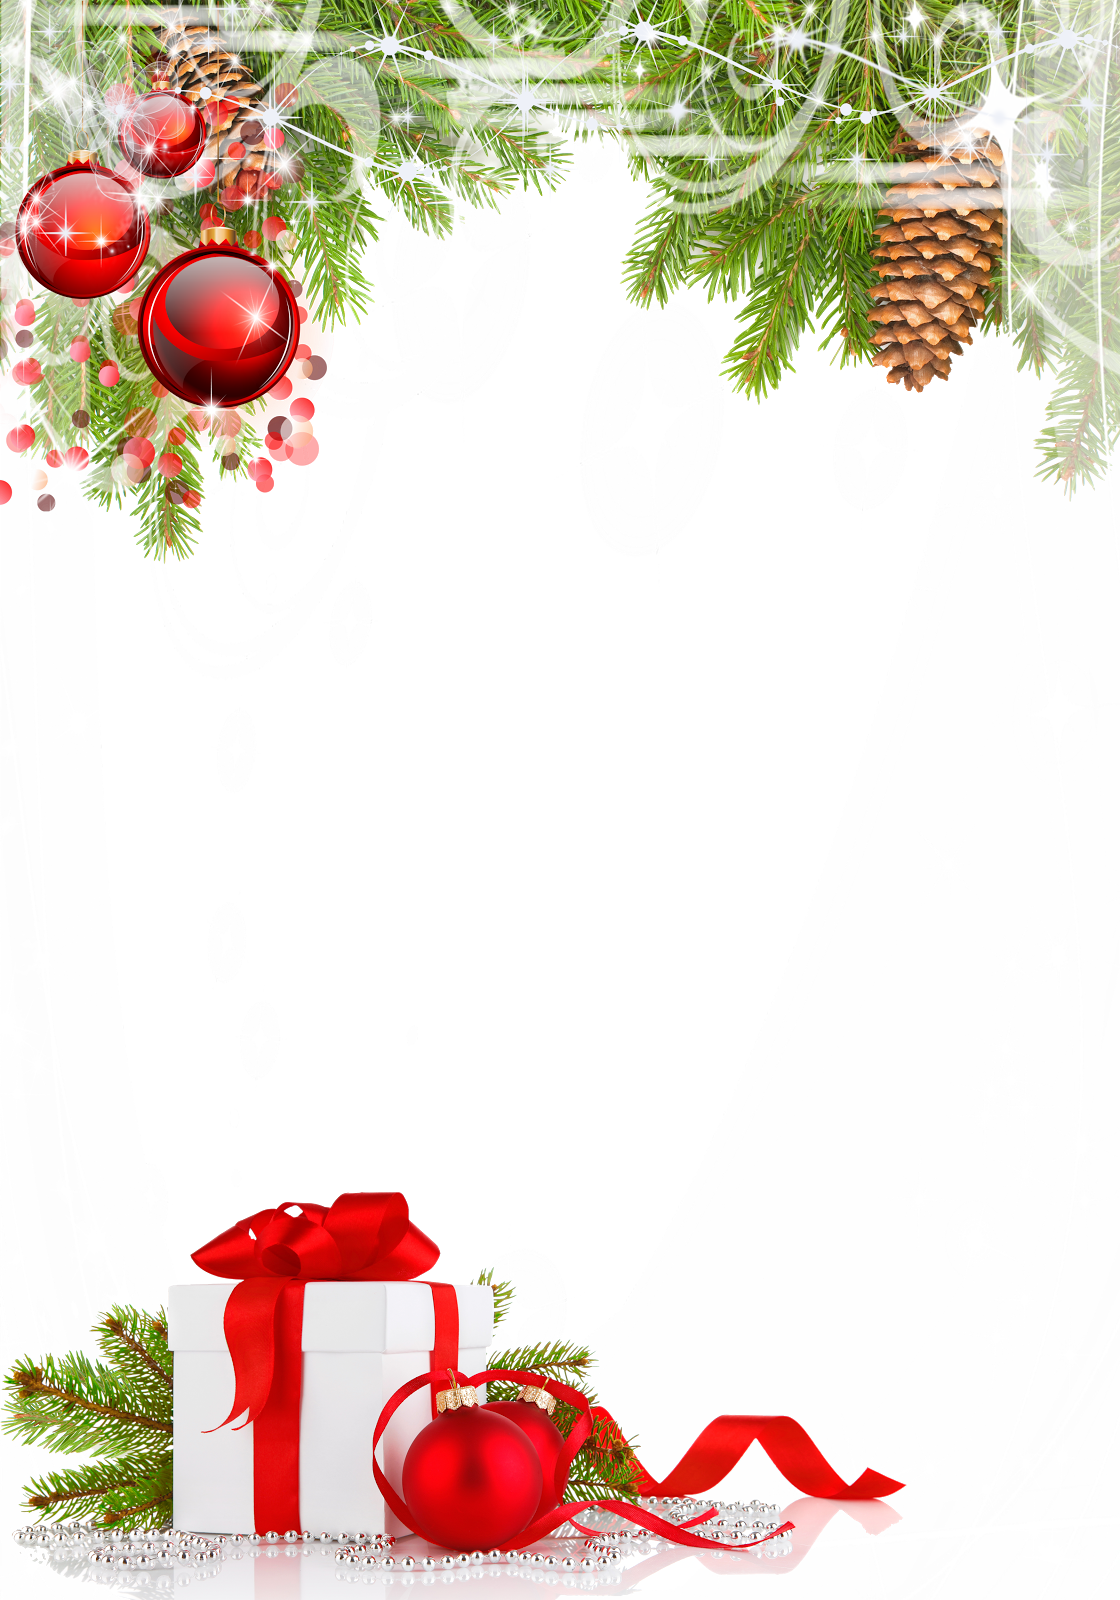 clipart de navidad para photoshop - photo #16